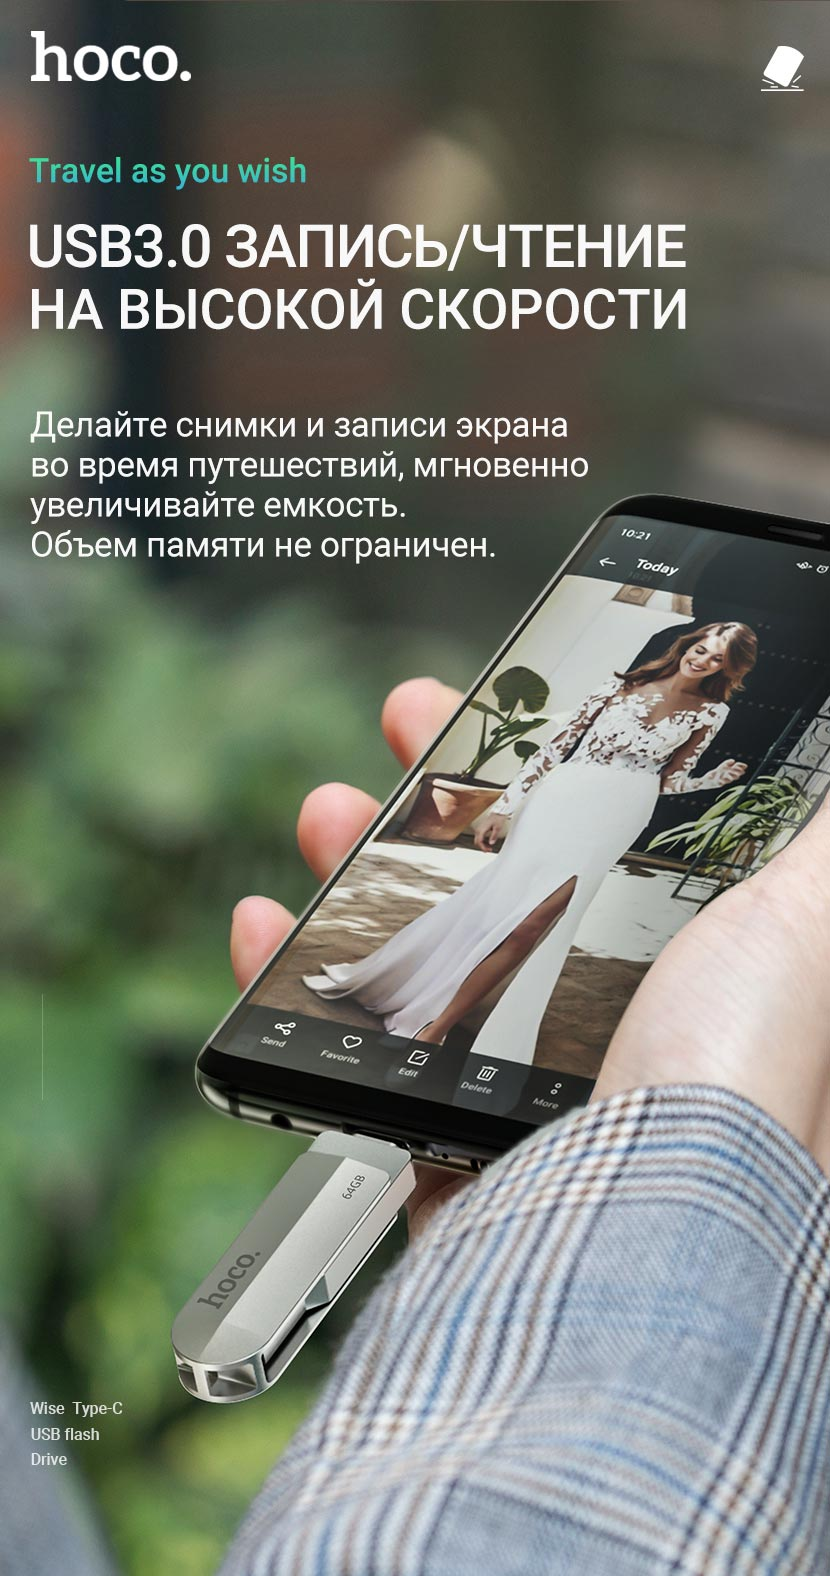 hoco news ud10 wise type c usb flash drive speed ru